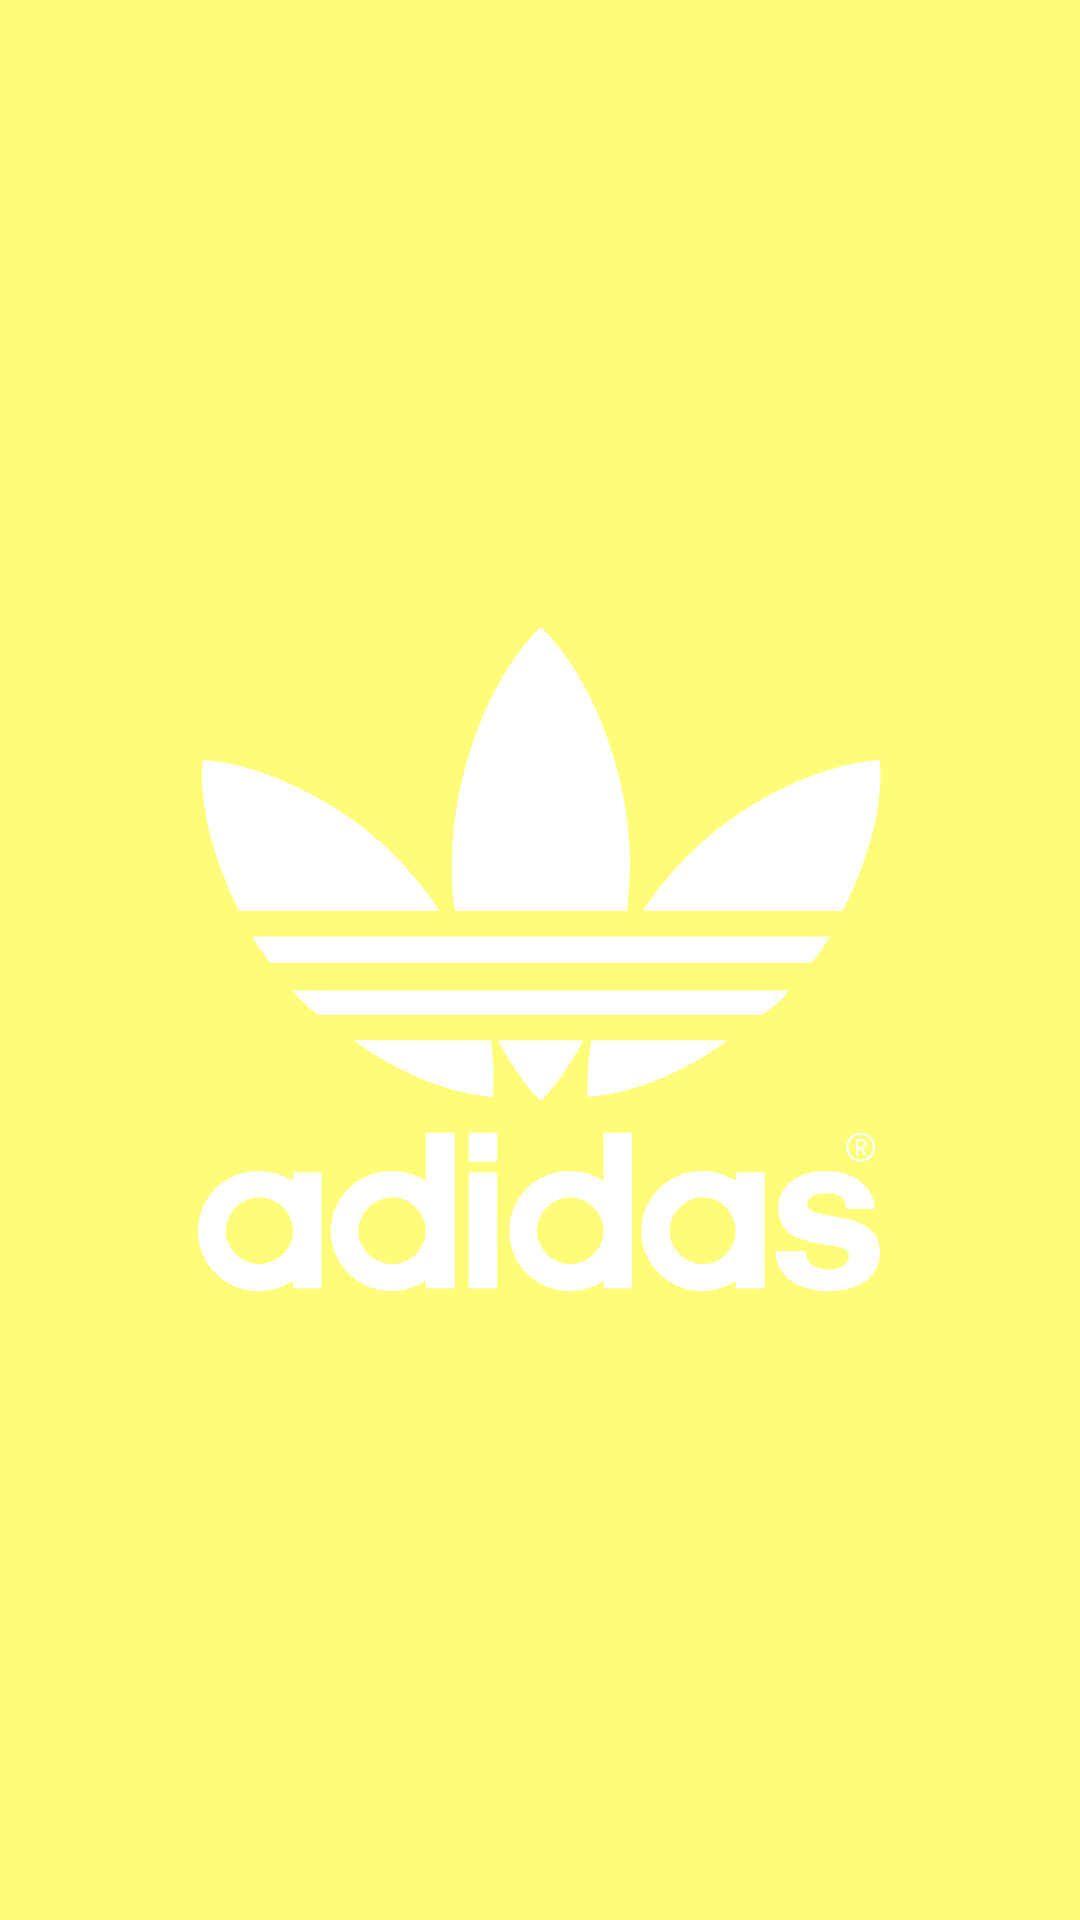 Adidas アディダス の高画質スマホ壁紙25枚 かわいい 壁紙 Iphone スマホ 壁紙 可愛い ストゥーシー 壁紙